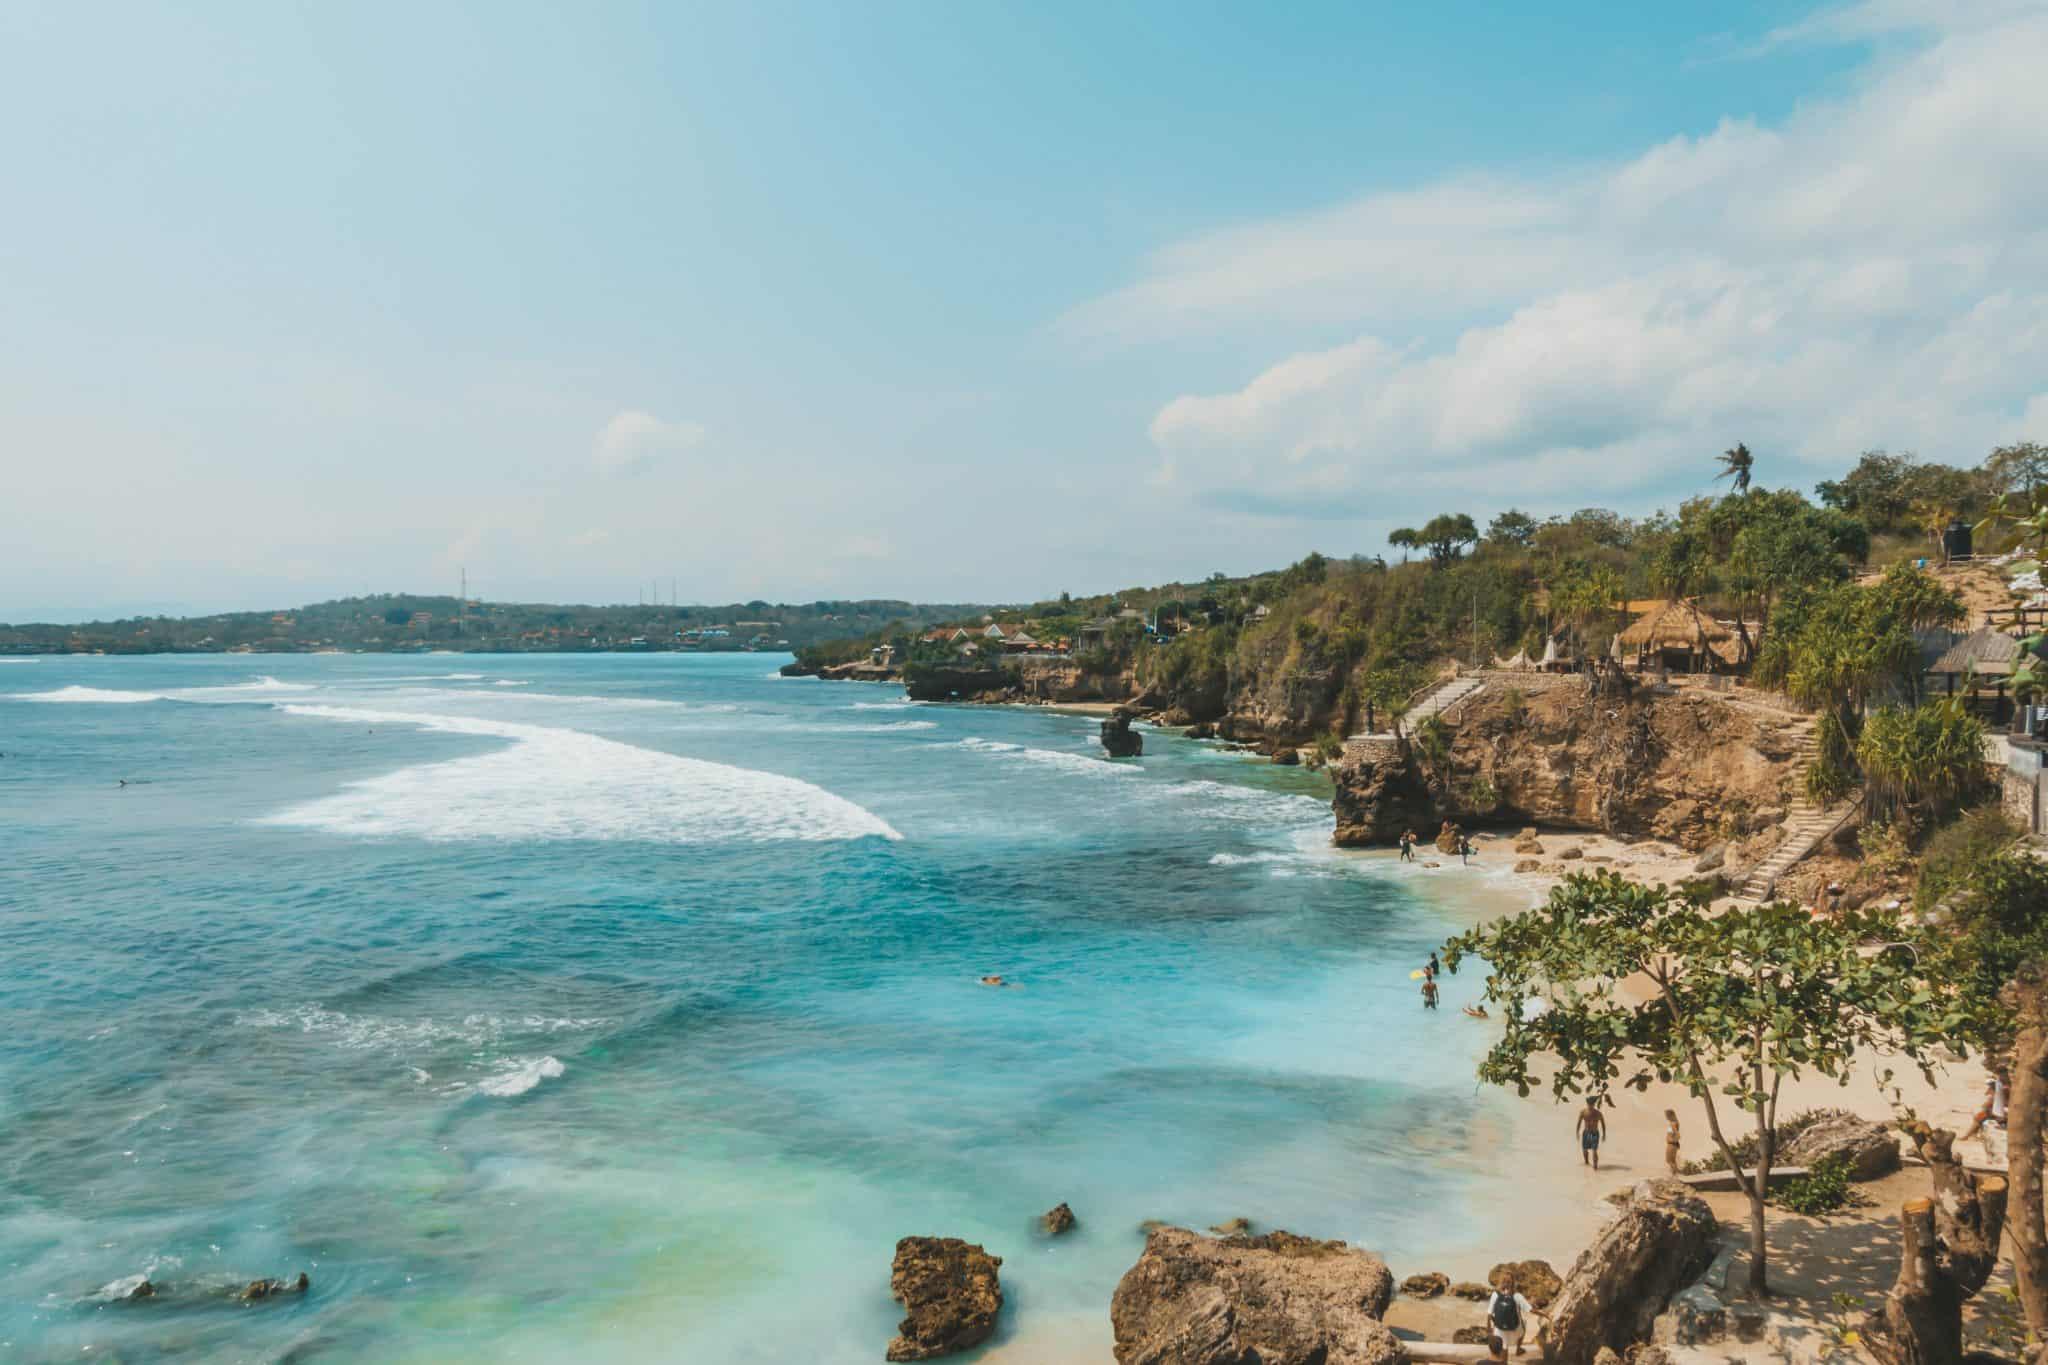 Things to do in Nusa ceningan